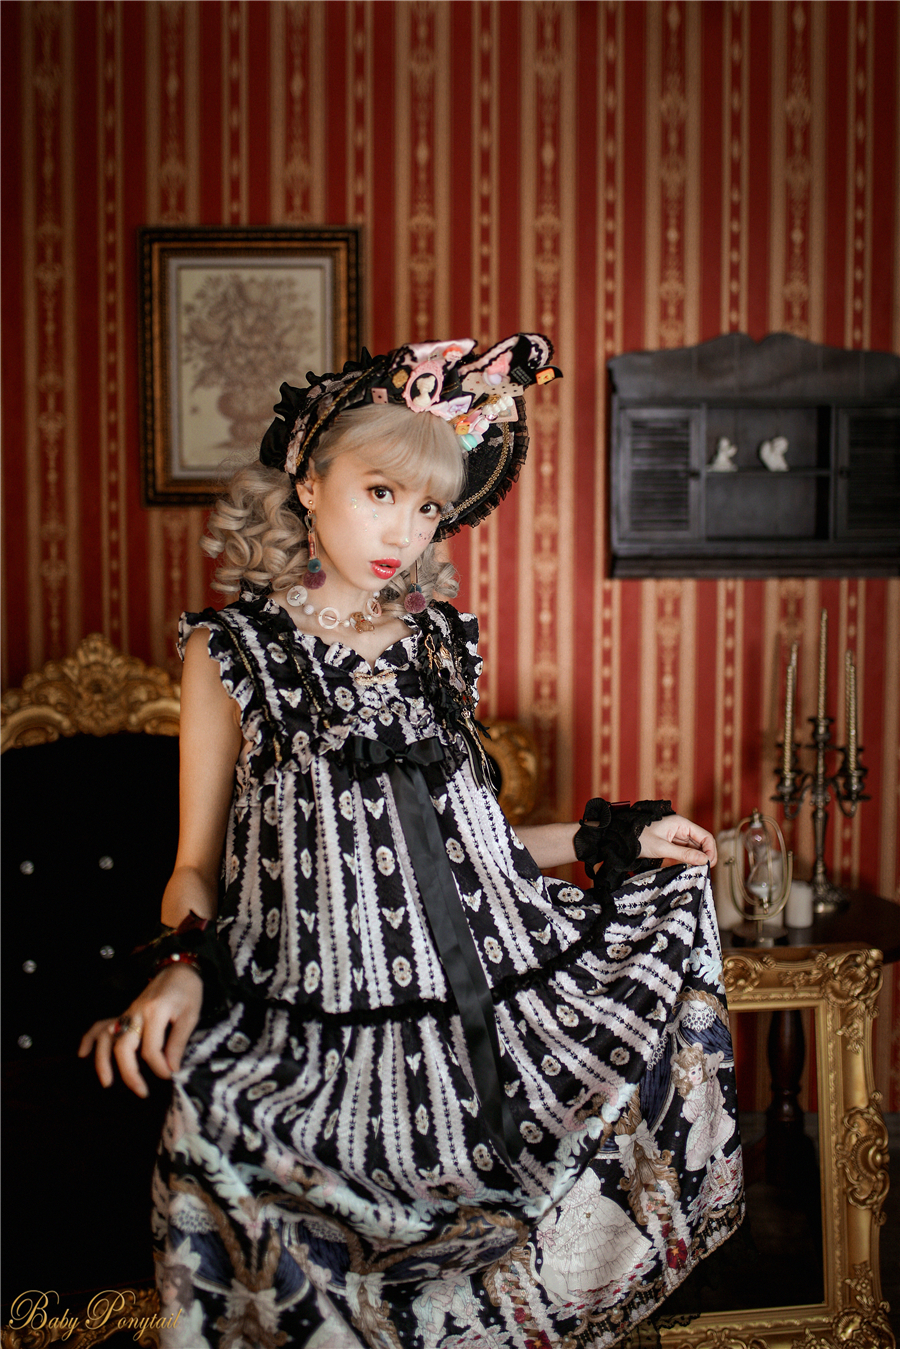 BabyPonytail_Model Photo_My Favorite Companion_NG Black_Kaka_1_5.jpg